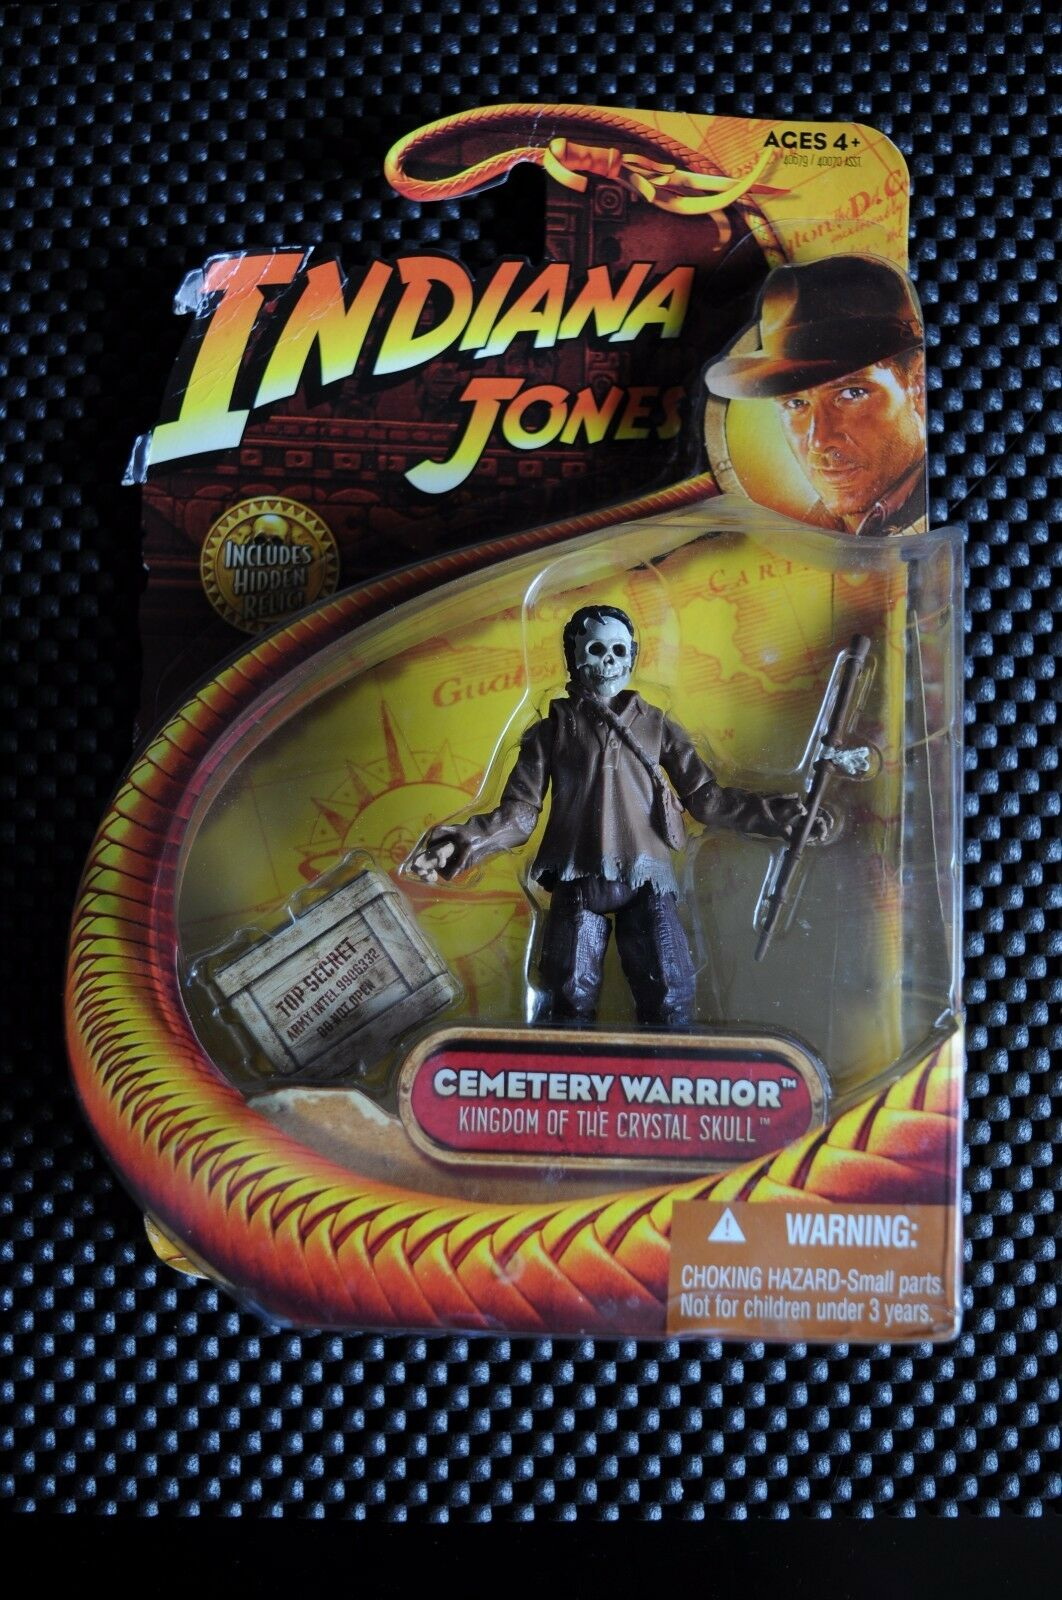 INDIANA JONES KINGDOM OF THE CRYSTAL SKULL INDIANA JONES - CEMETERY WARRIOR